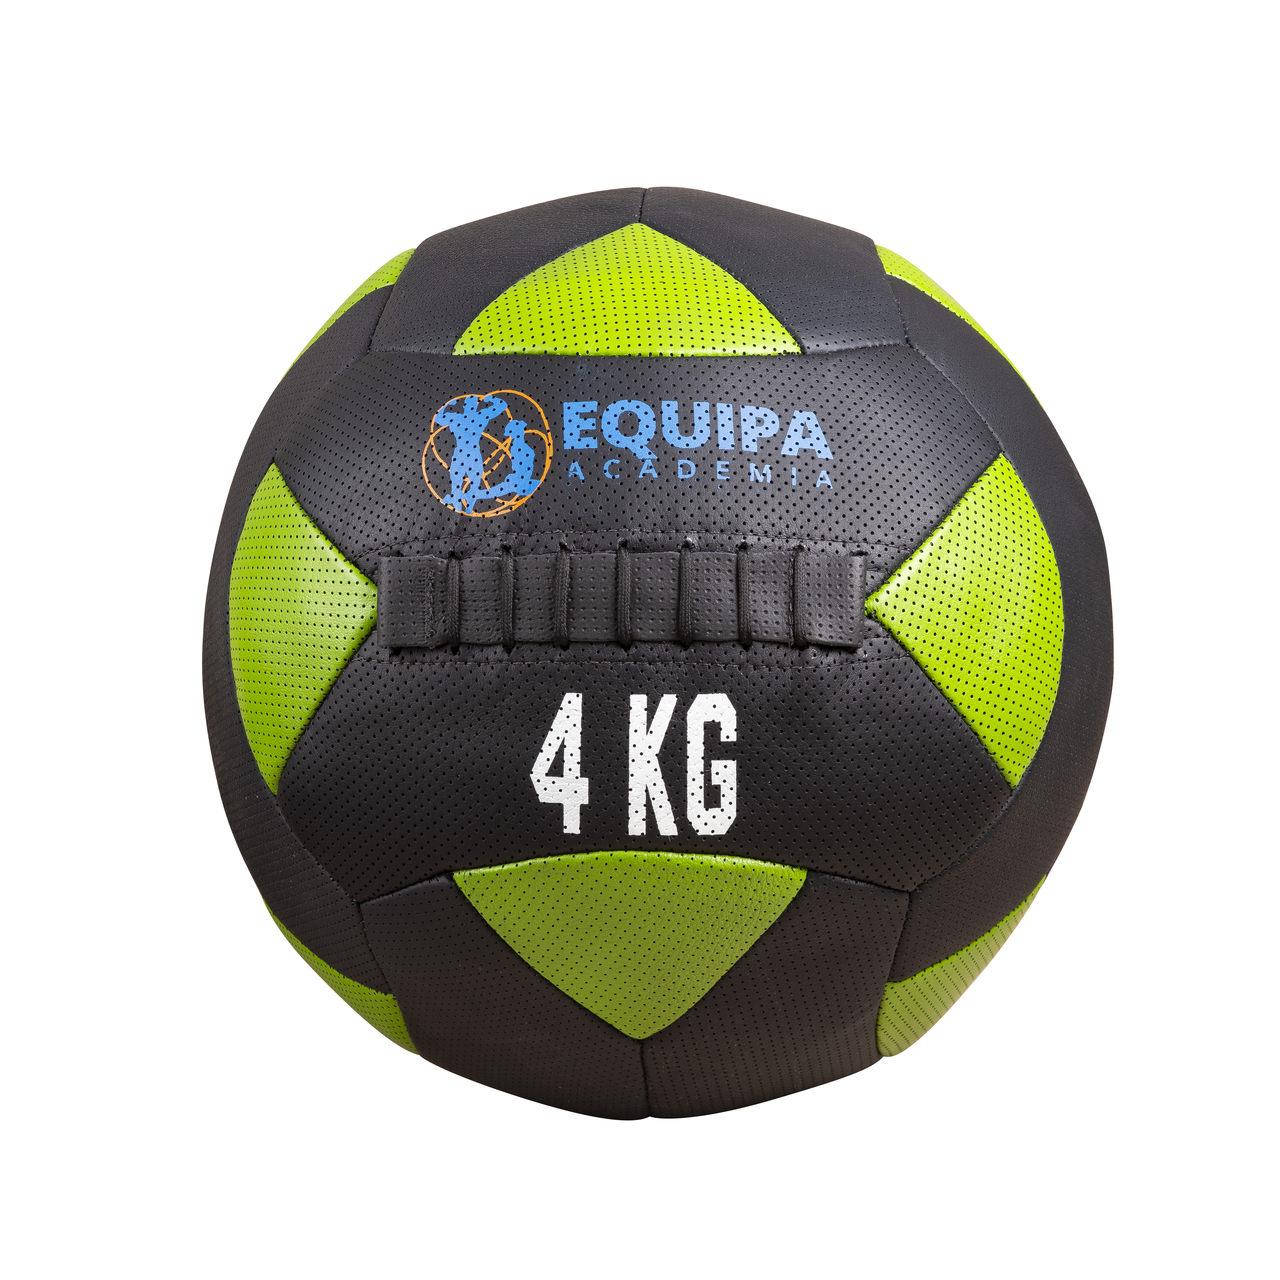 Kit Corda Naval 40MM 10Metros + Wall Ball Couro 04KG